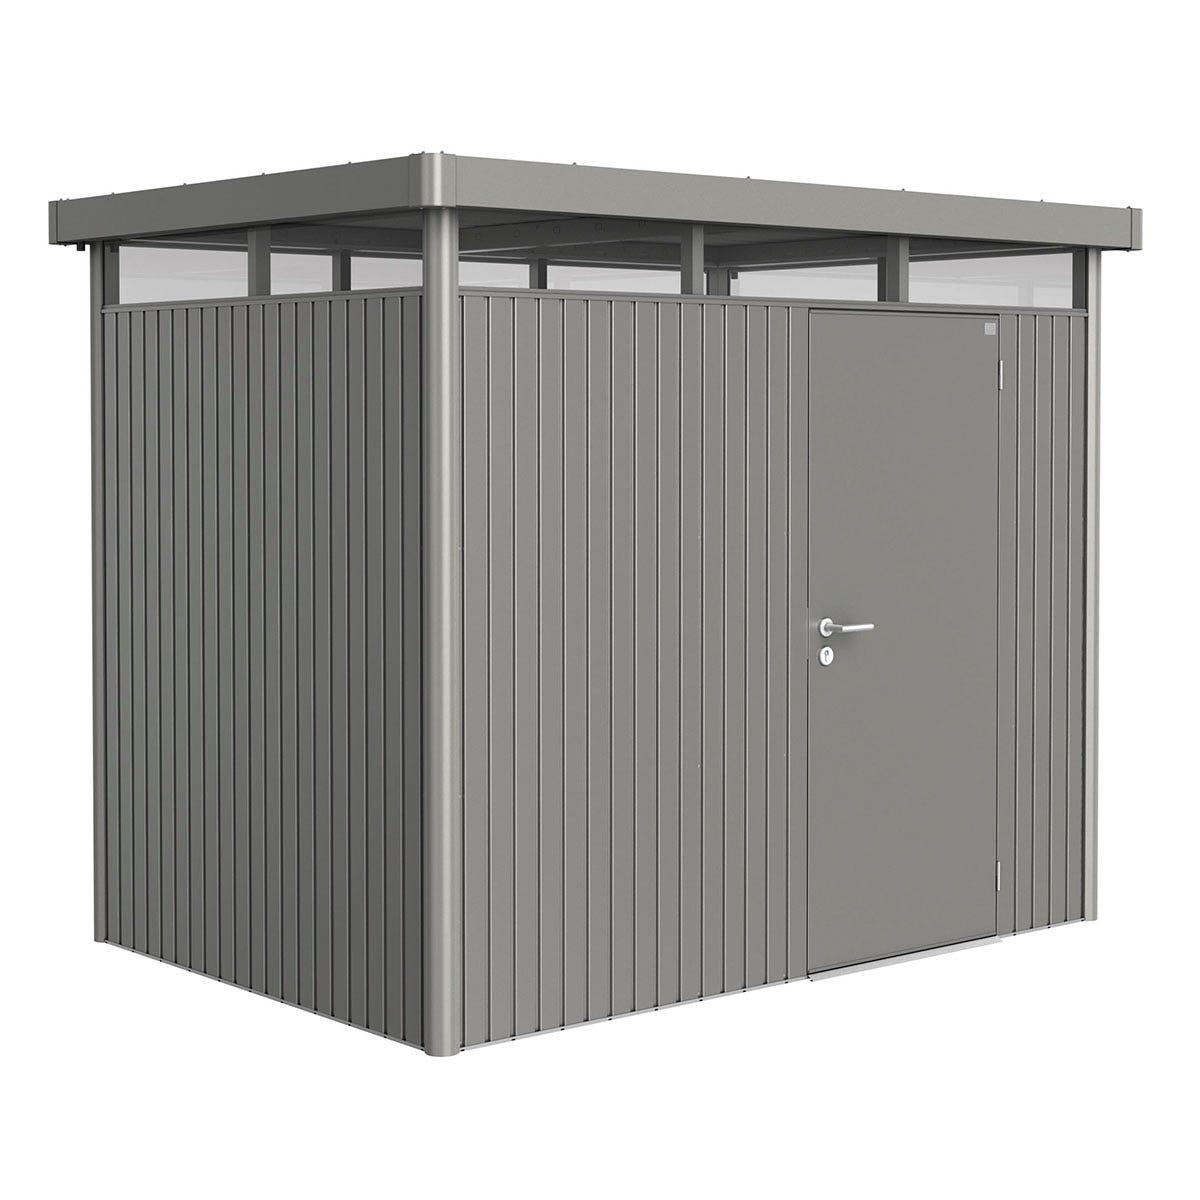 Biohort Highline Metal Shed H2 Standard door 9 x 6 - Quartz Grey